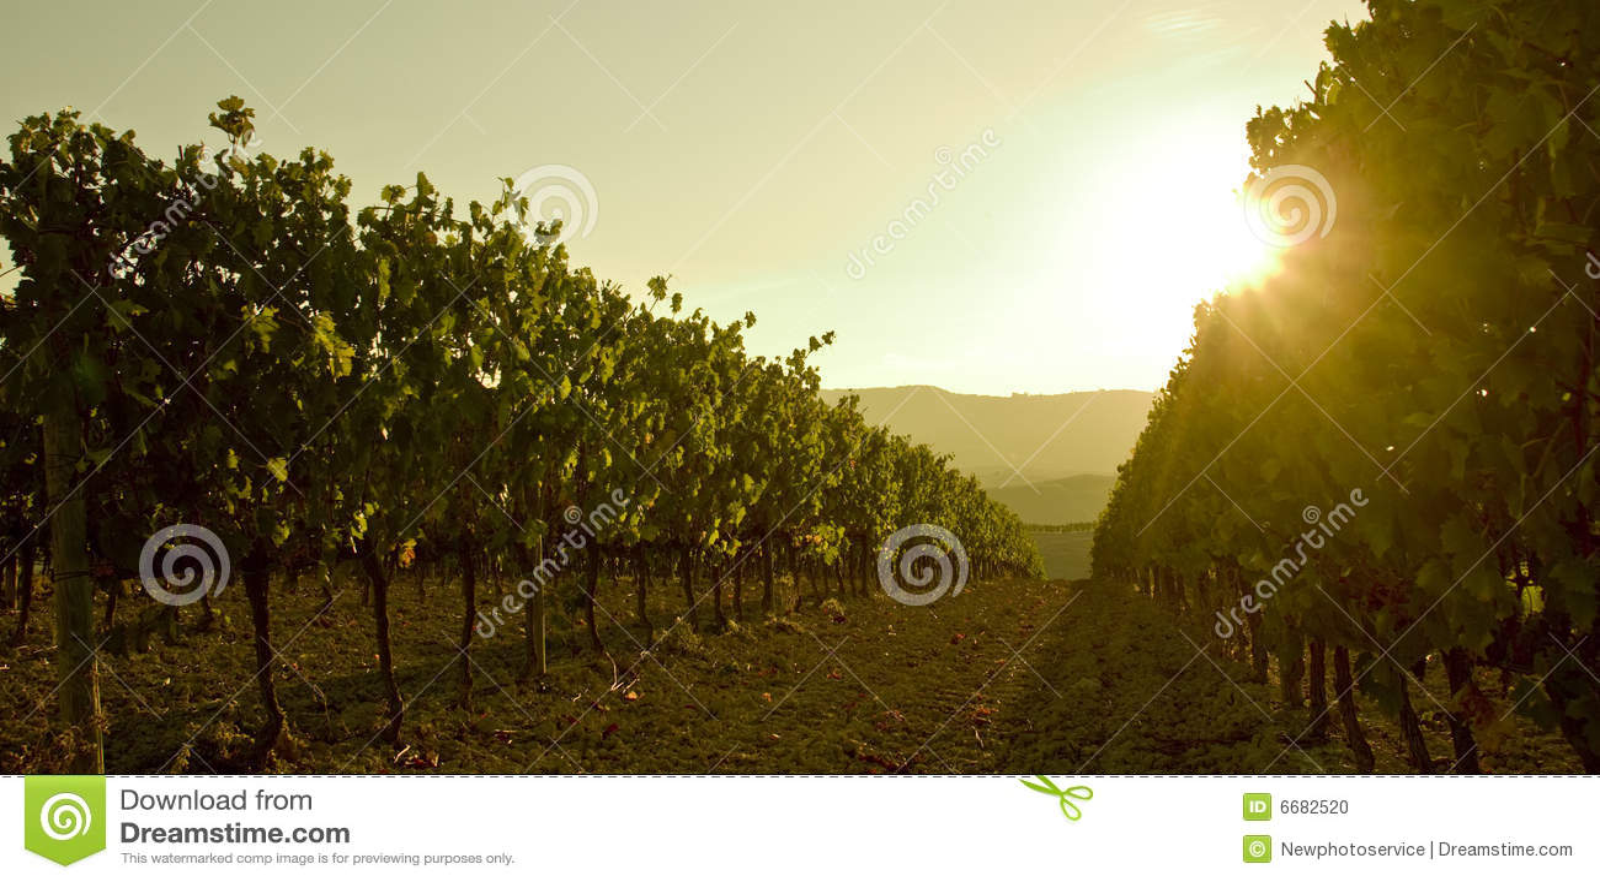 Grapesvine at sunset